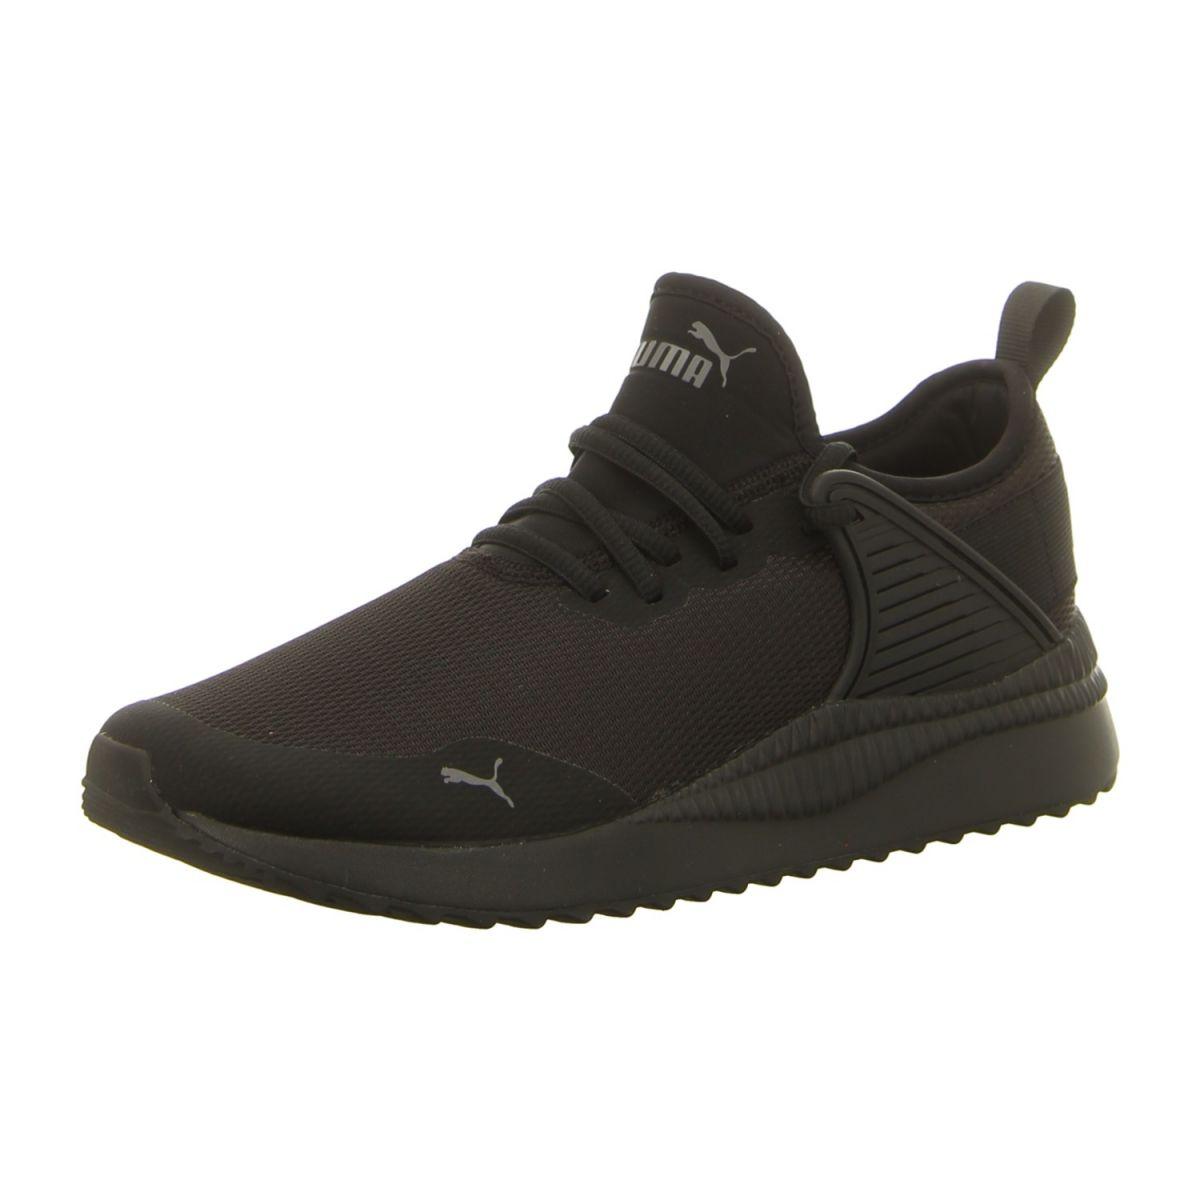 Puma Schuhe Sneaker Pacer Next Cage 365284 001 puma black puma black schwarz